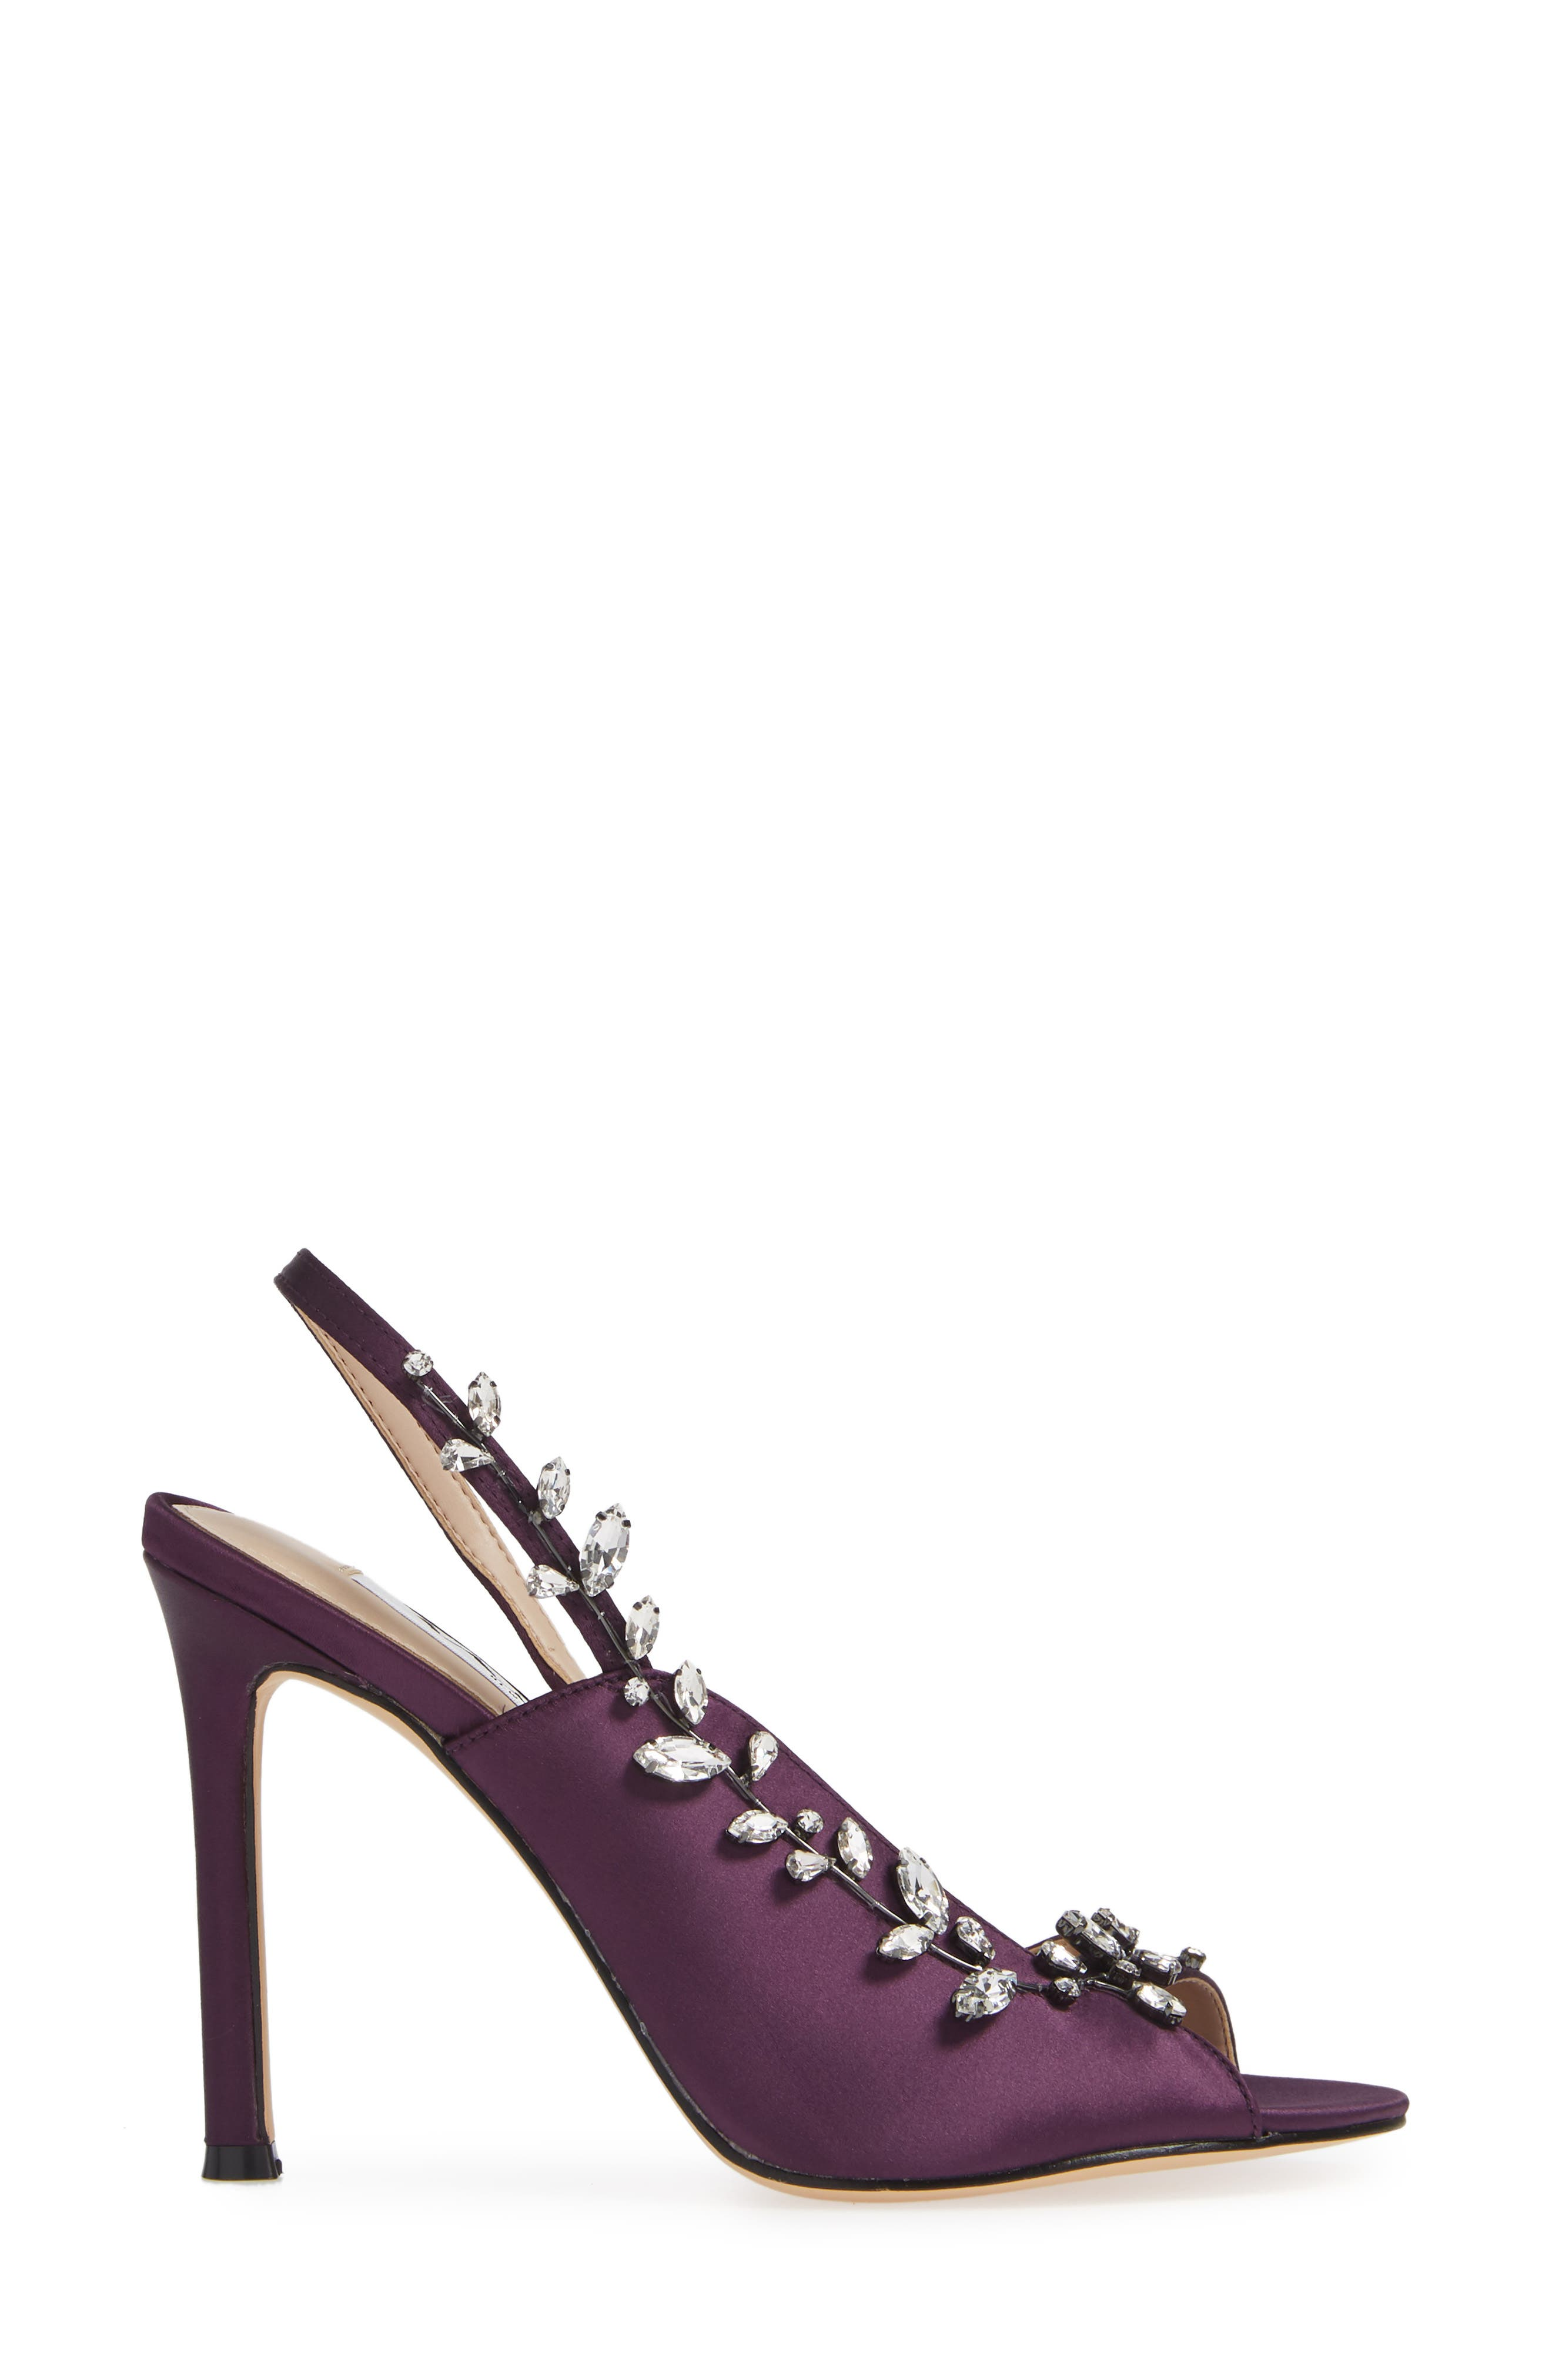 NINA, Deanna Embellished Sandal, Alternate thumbnail 3, color, EGGPLANT SATIN